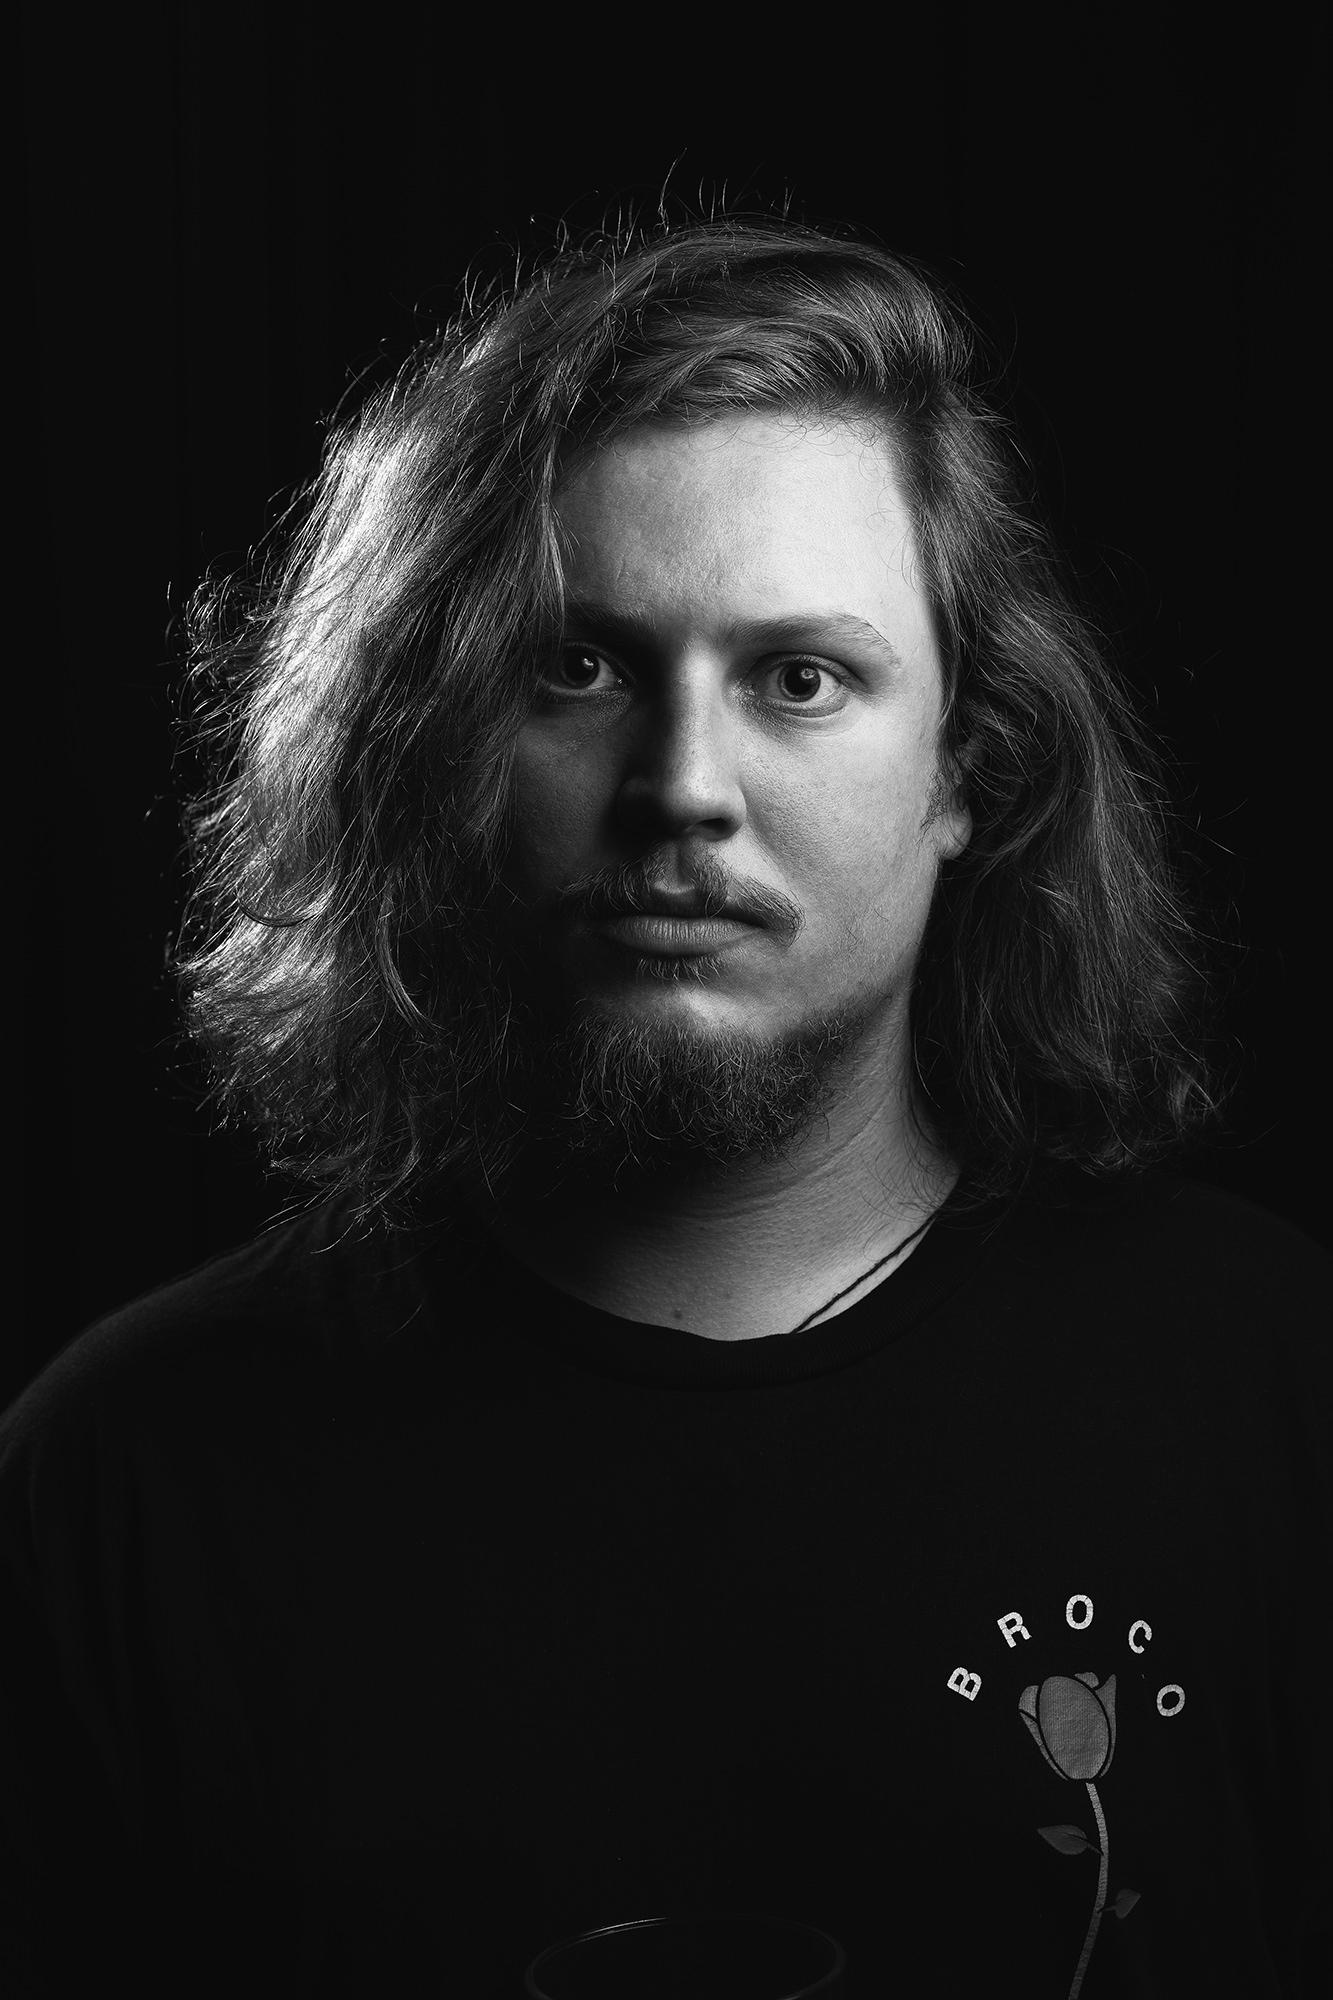 Michael Petritsch - GuitarGravemind